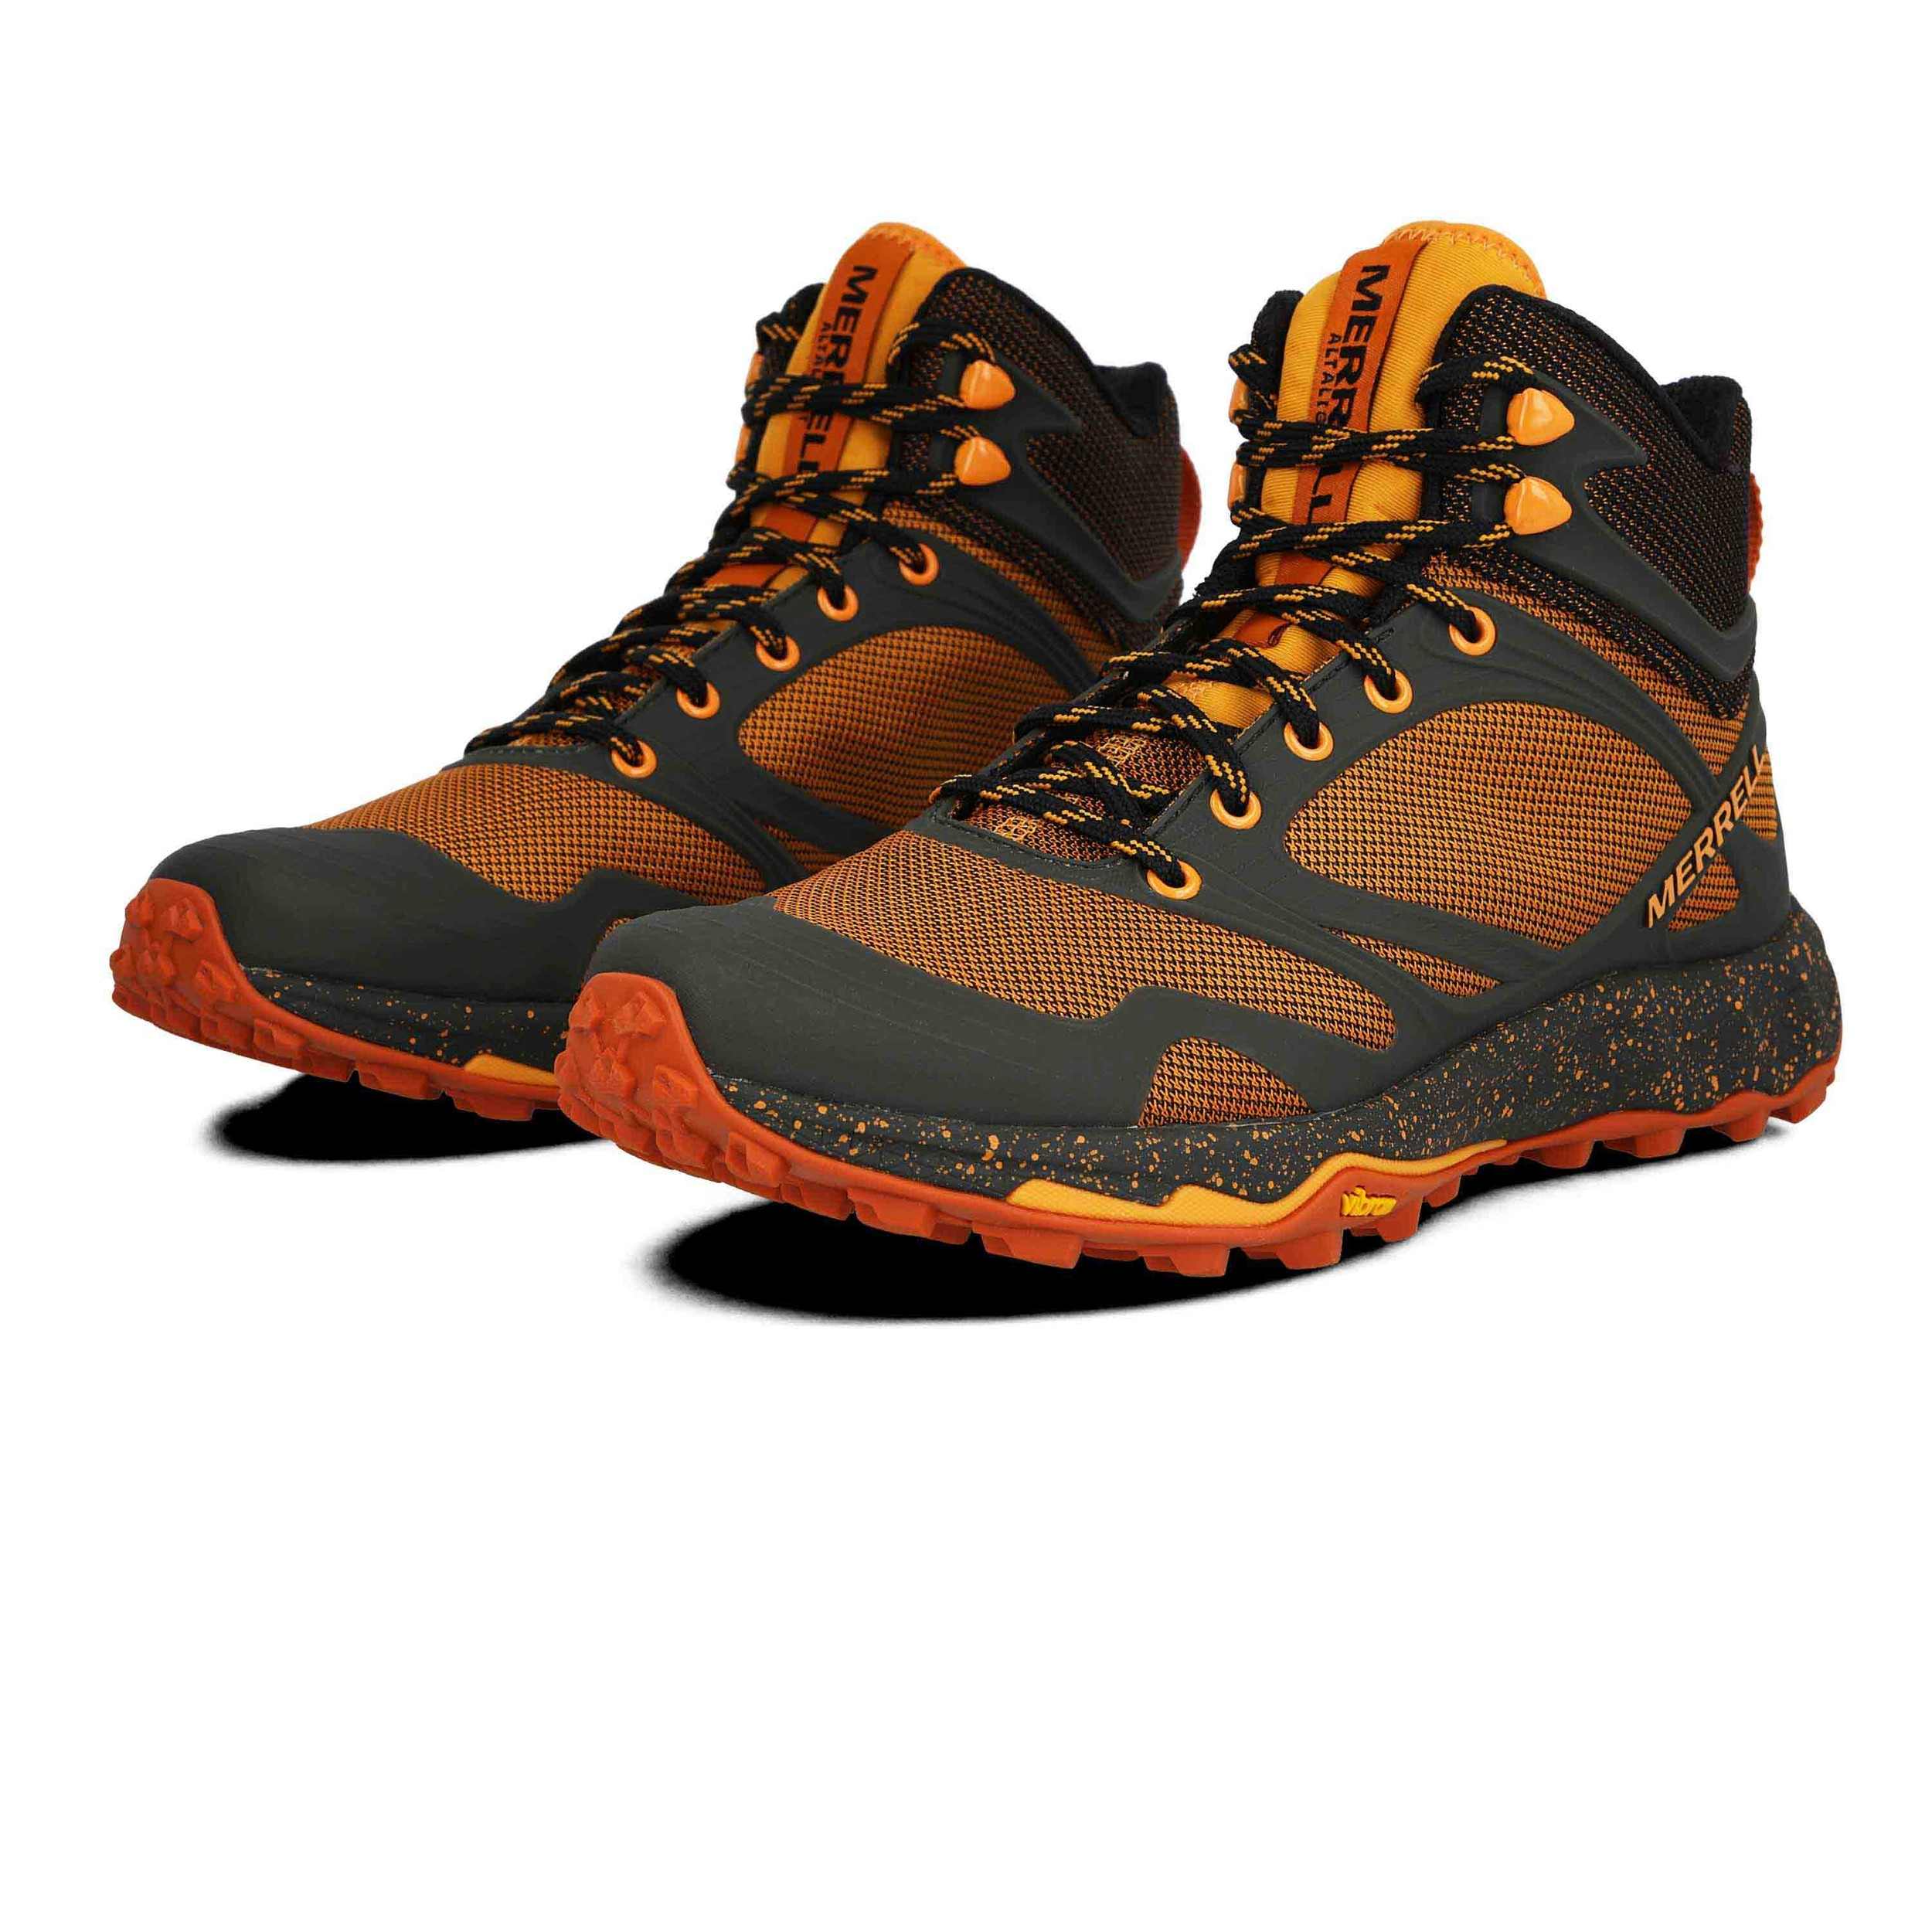 Merrell Altalight Knit Mid Walking Boots - Ss20